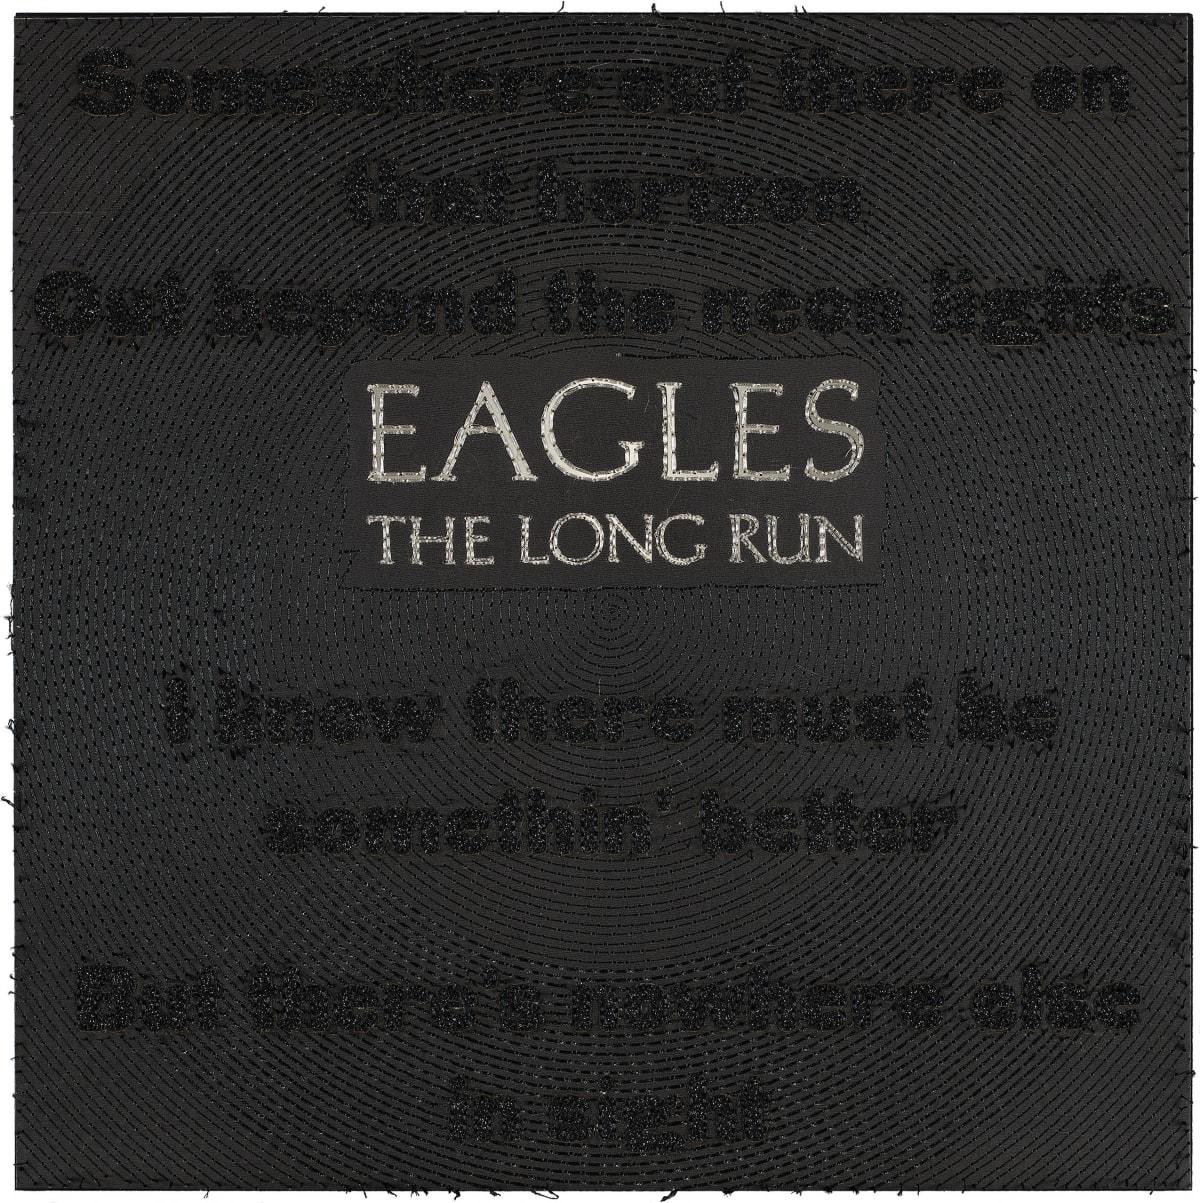 Stephen Wilson, The Long Run, Eagles , 2019